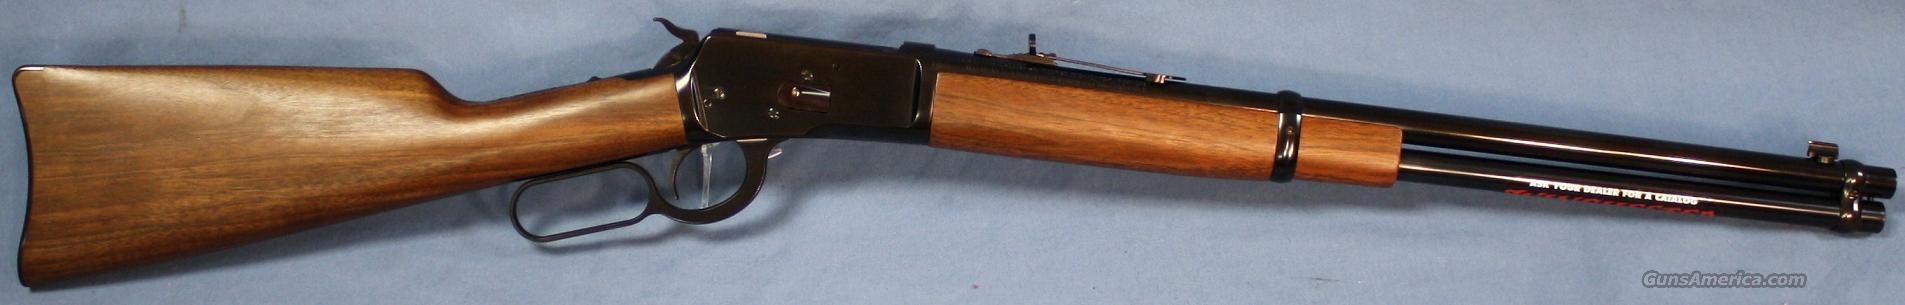 Winchester Leveractio Model 1892 357 Magnum Keyword Data